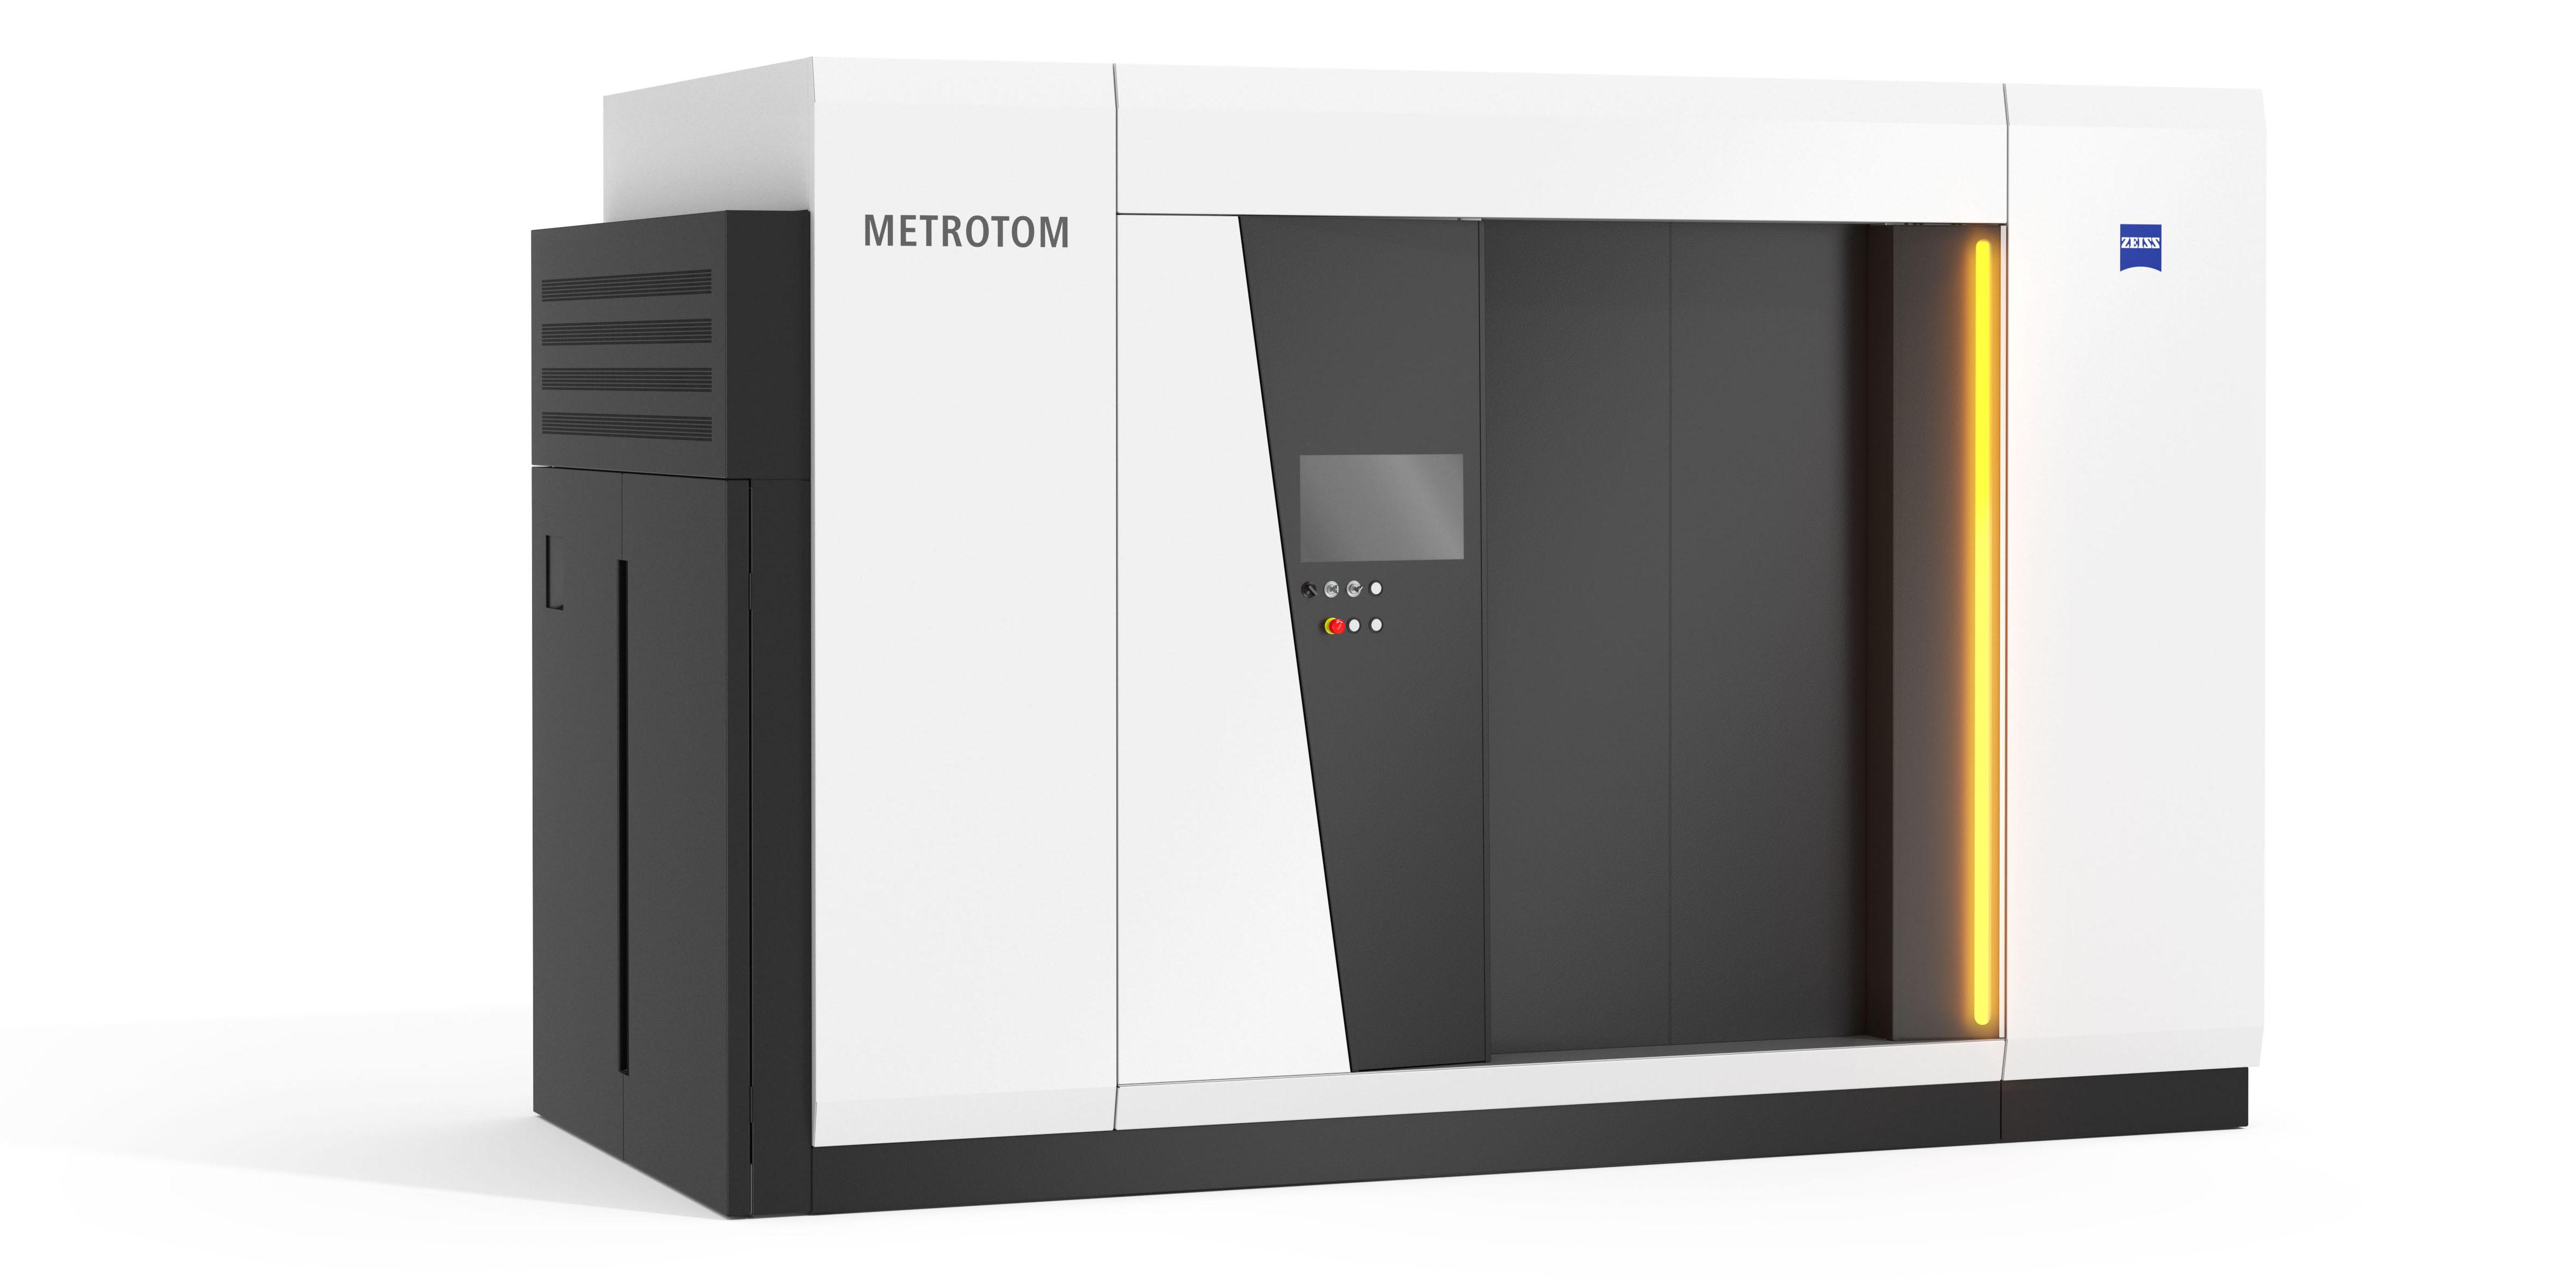 ZEISS Metrotom 1500